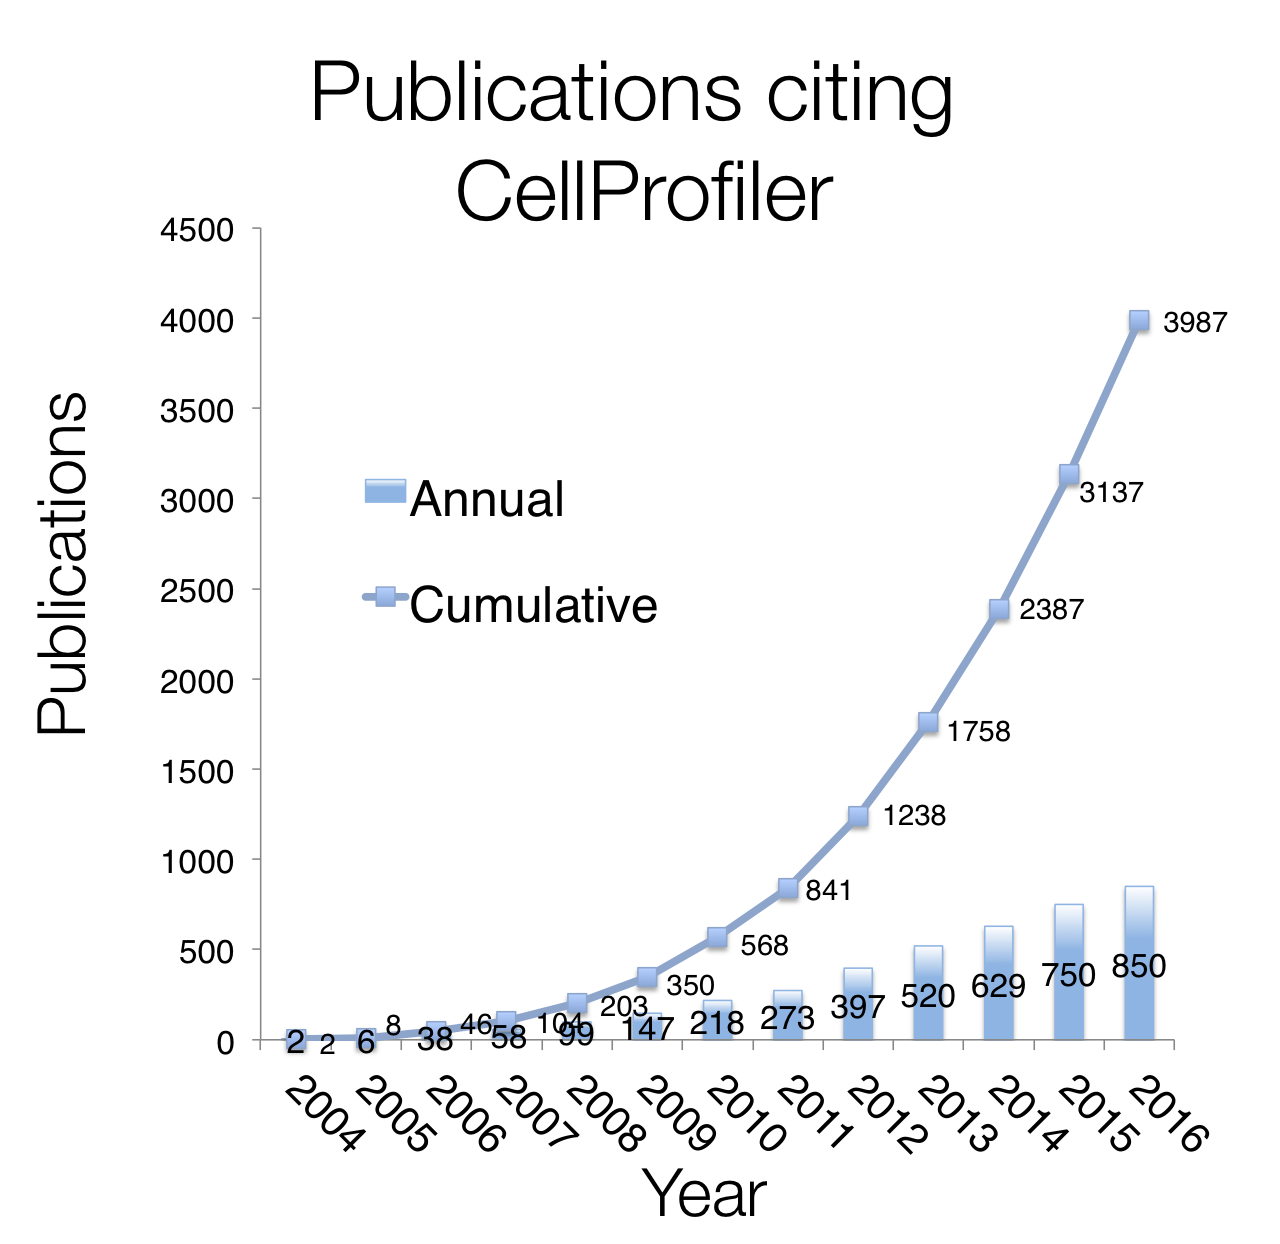 CellProfiler citation publication